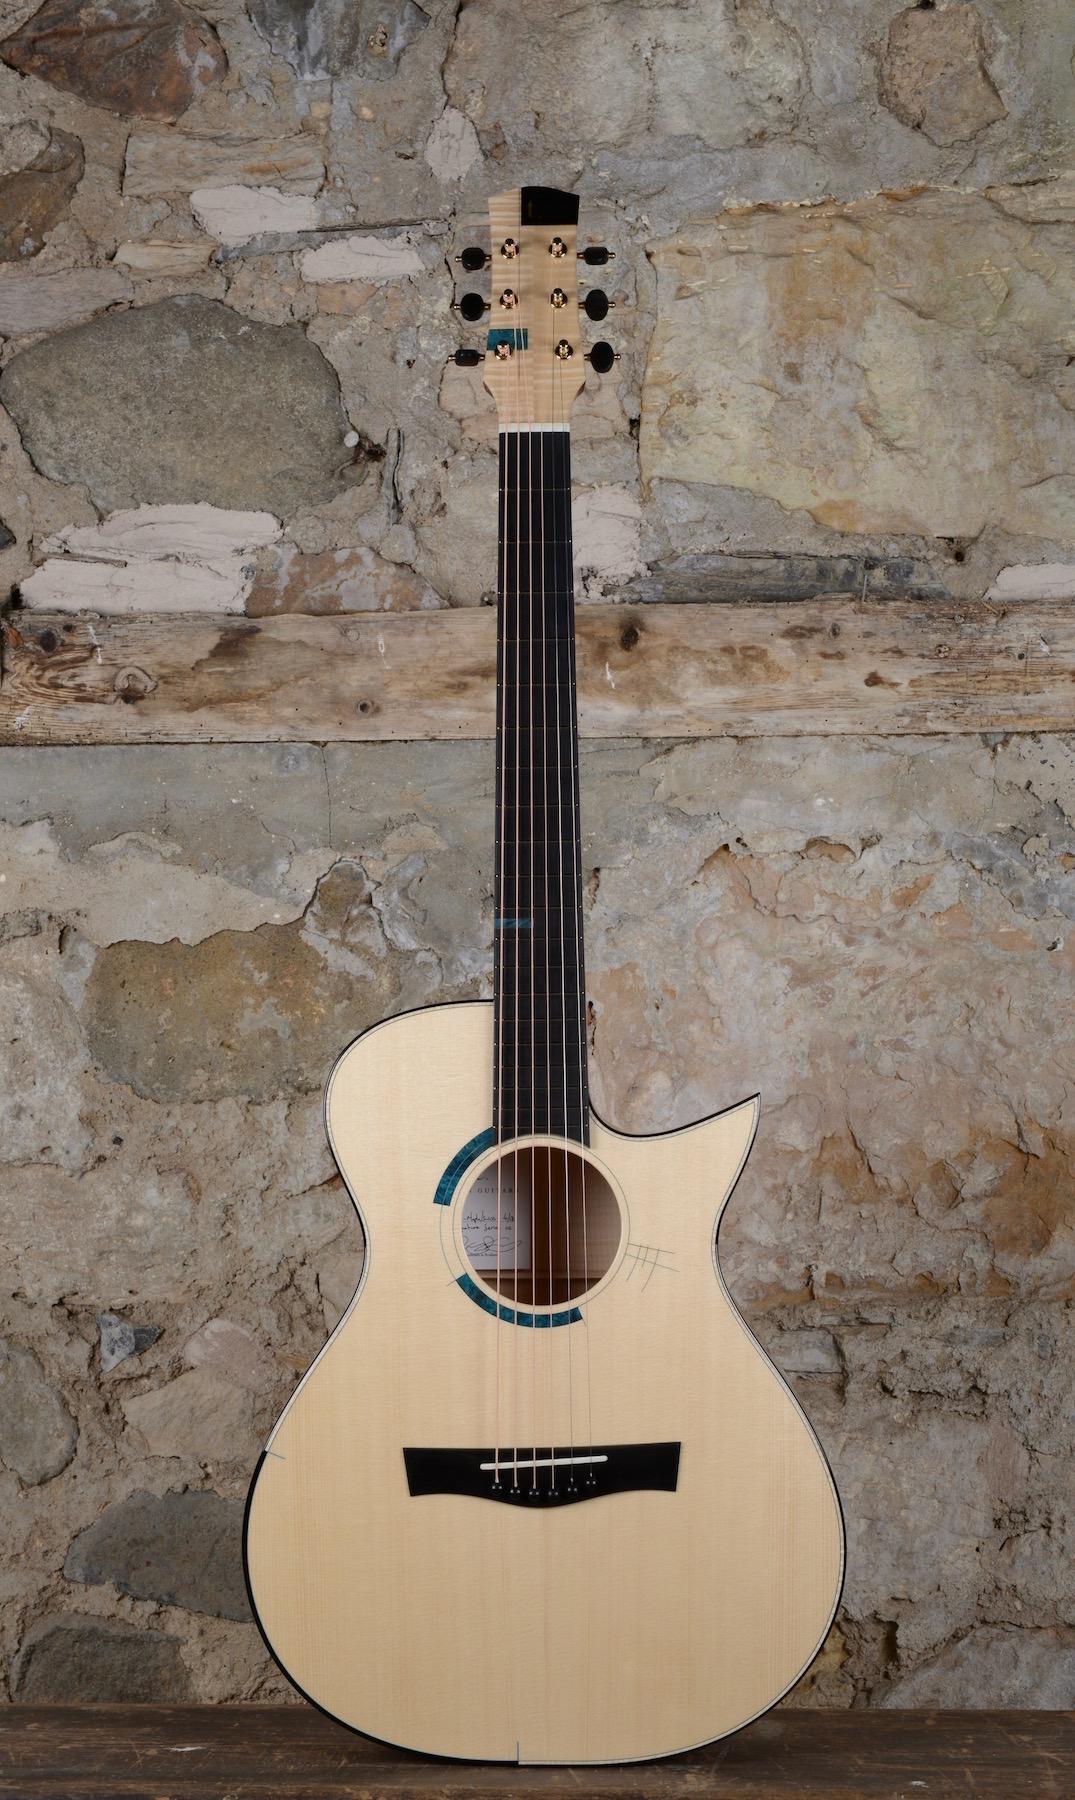 My 99th Guitar! A Maple/Swiss Moon Spruce Taran